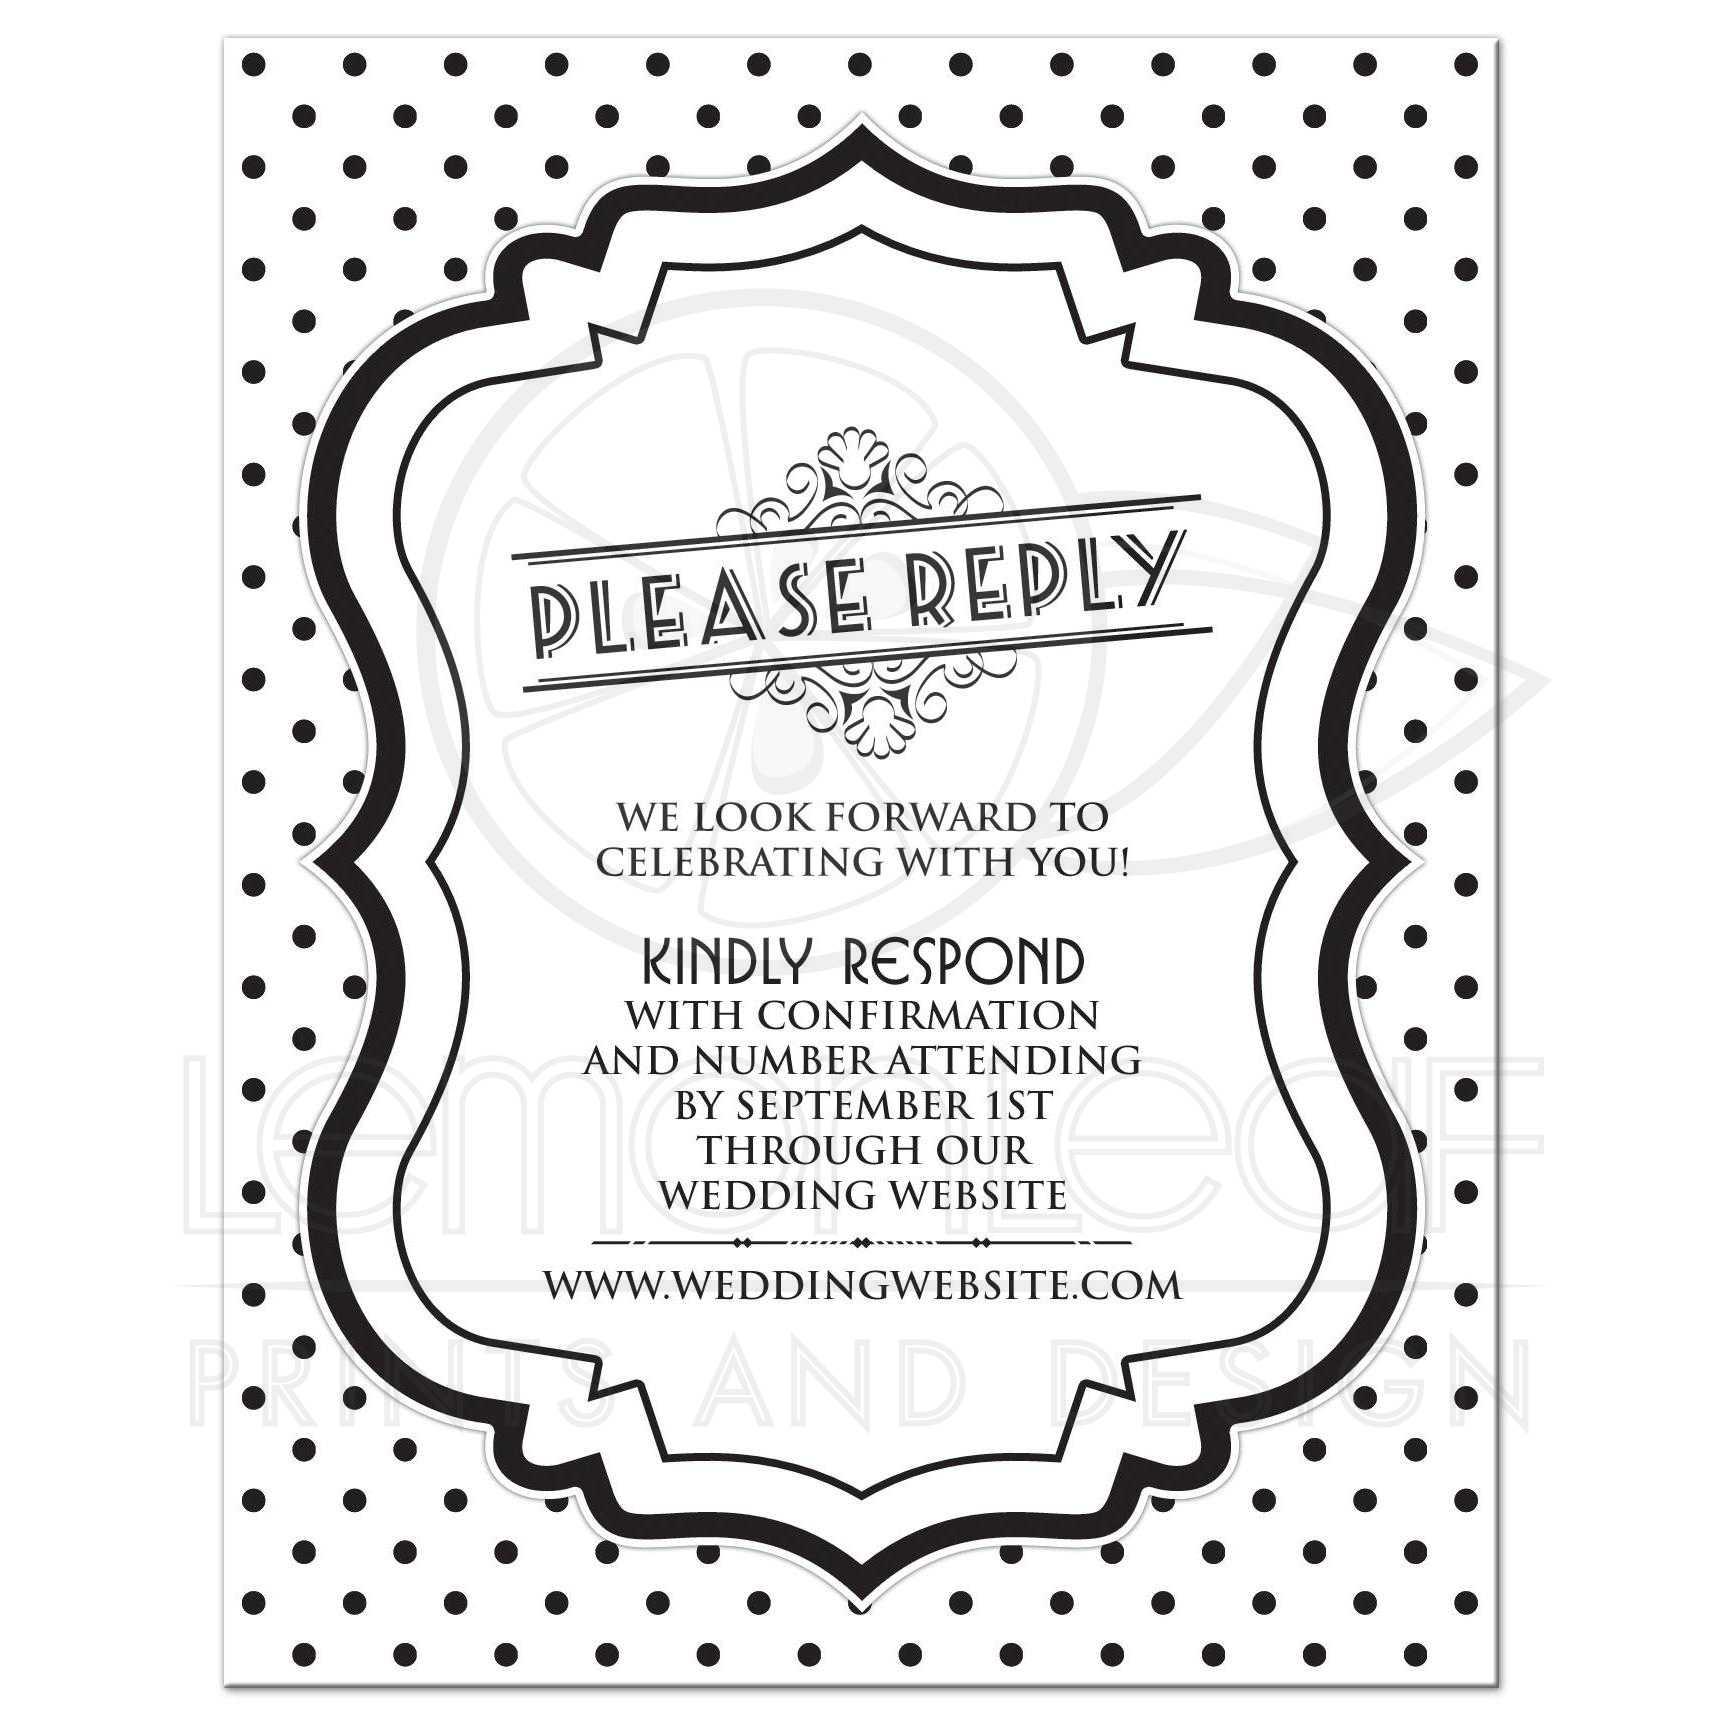 wedding website rsvp retro 50s black white polka dot